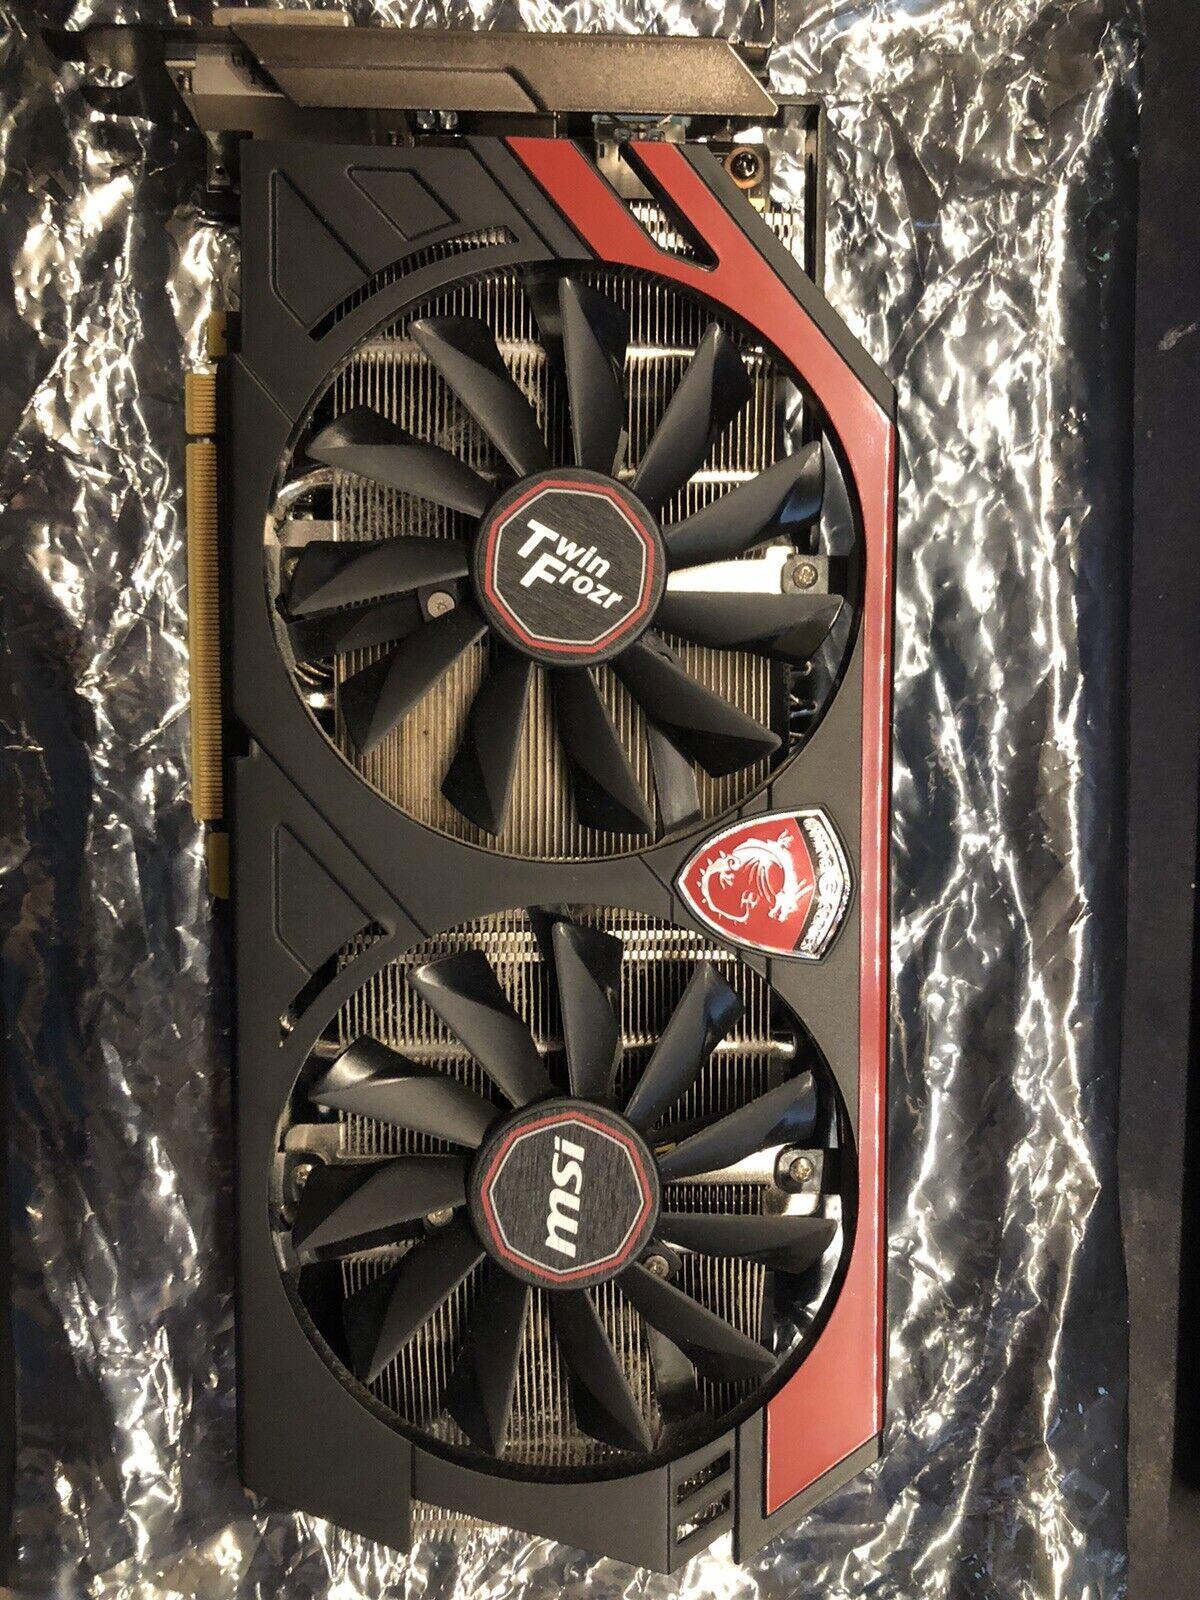 MSI GeForce GTX 760 2 GB TWIN FROZR GDDR5 VIDEO CARD (slightly used)